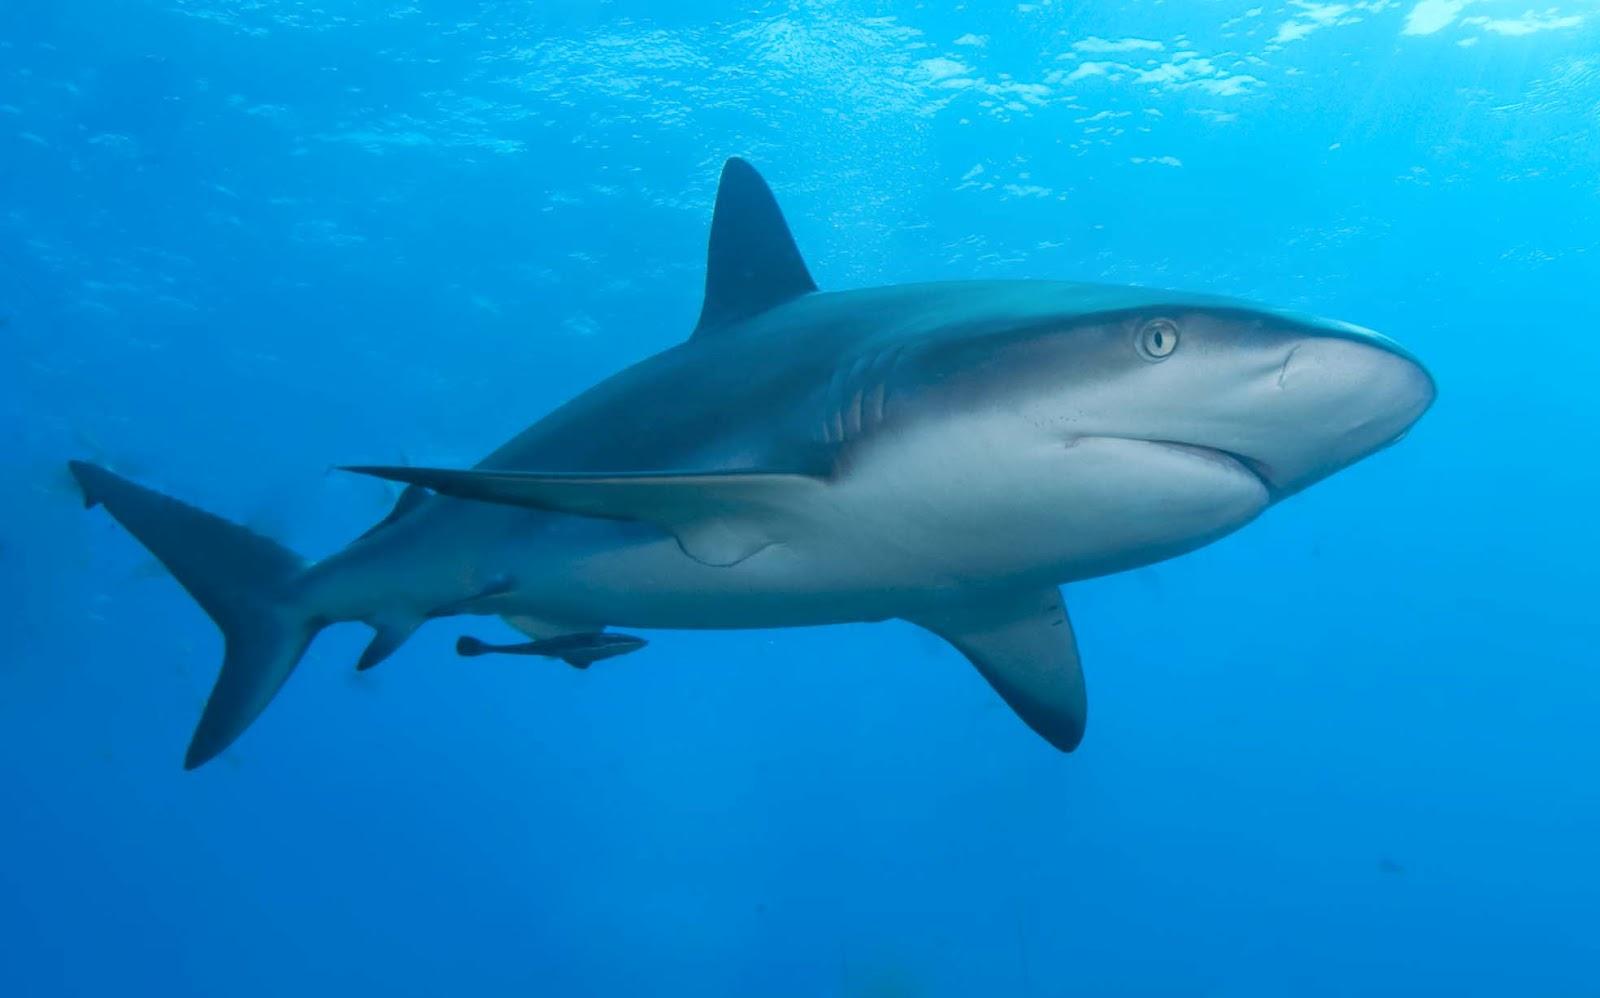 Shark fish the wildlife carribbeanreefshark altavistaventures Choice Image